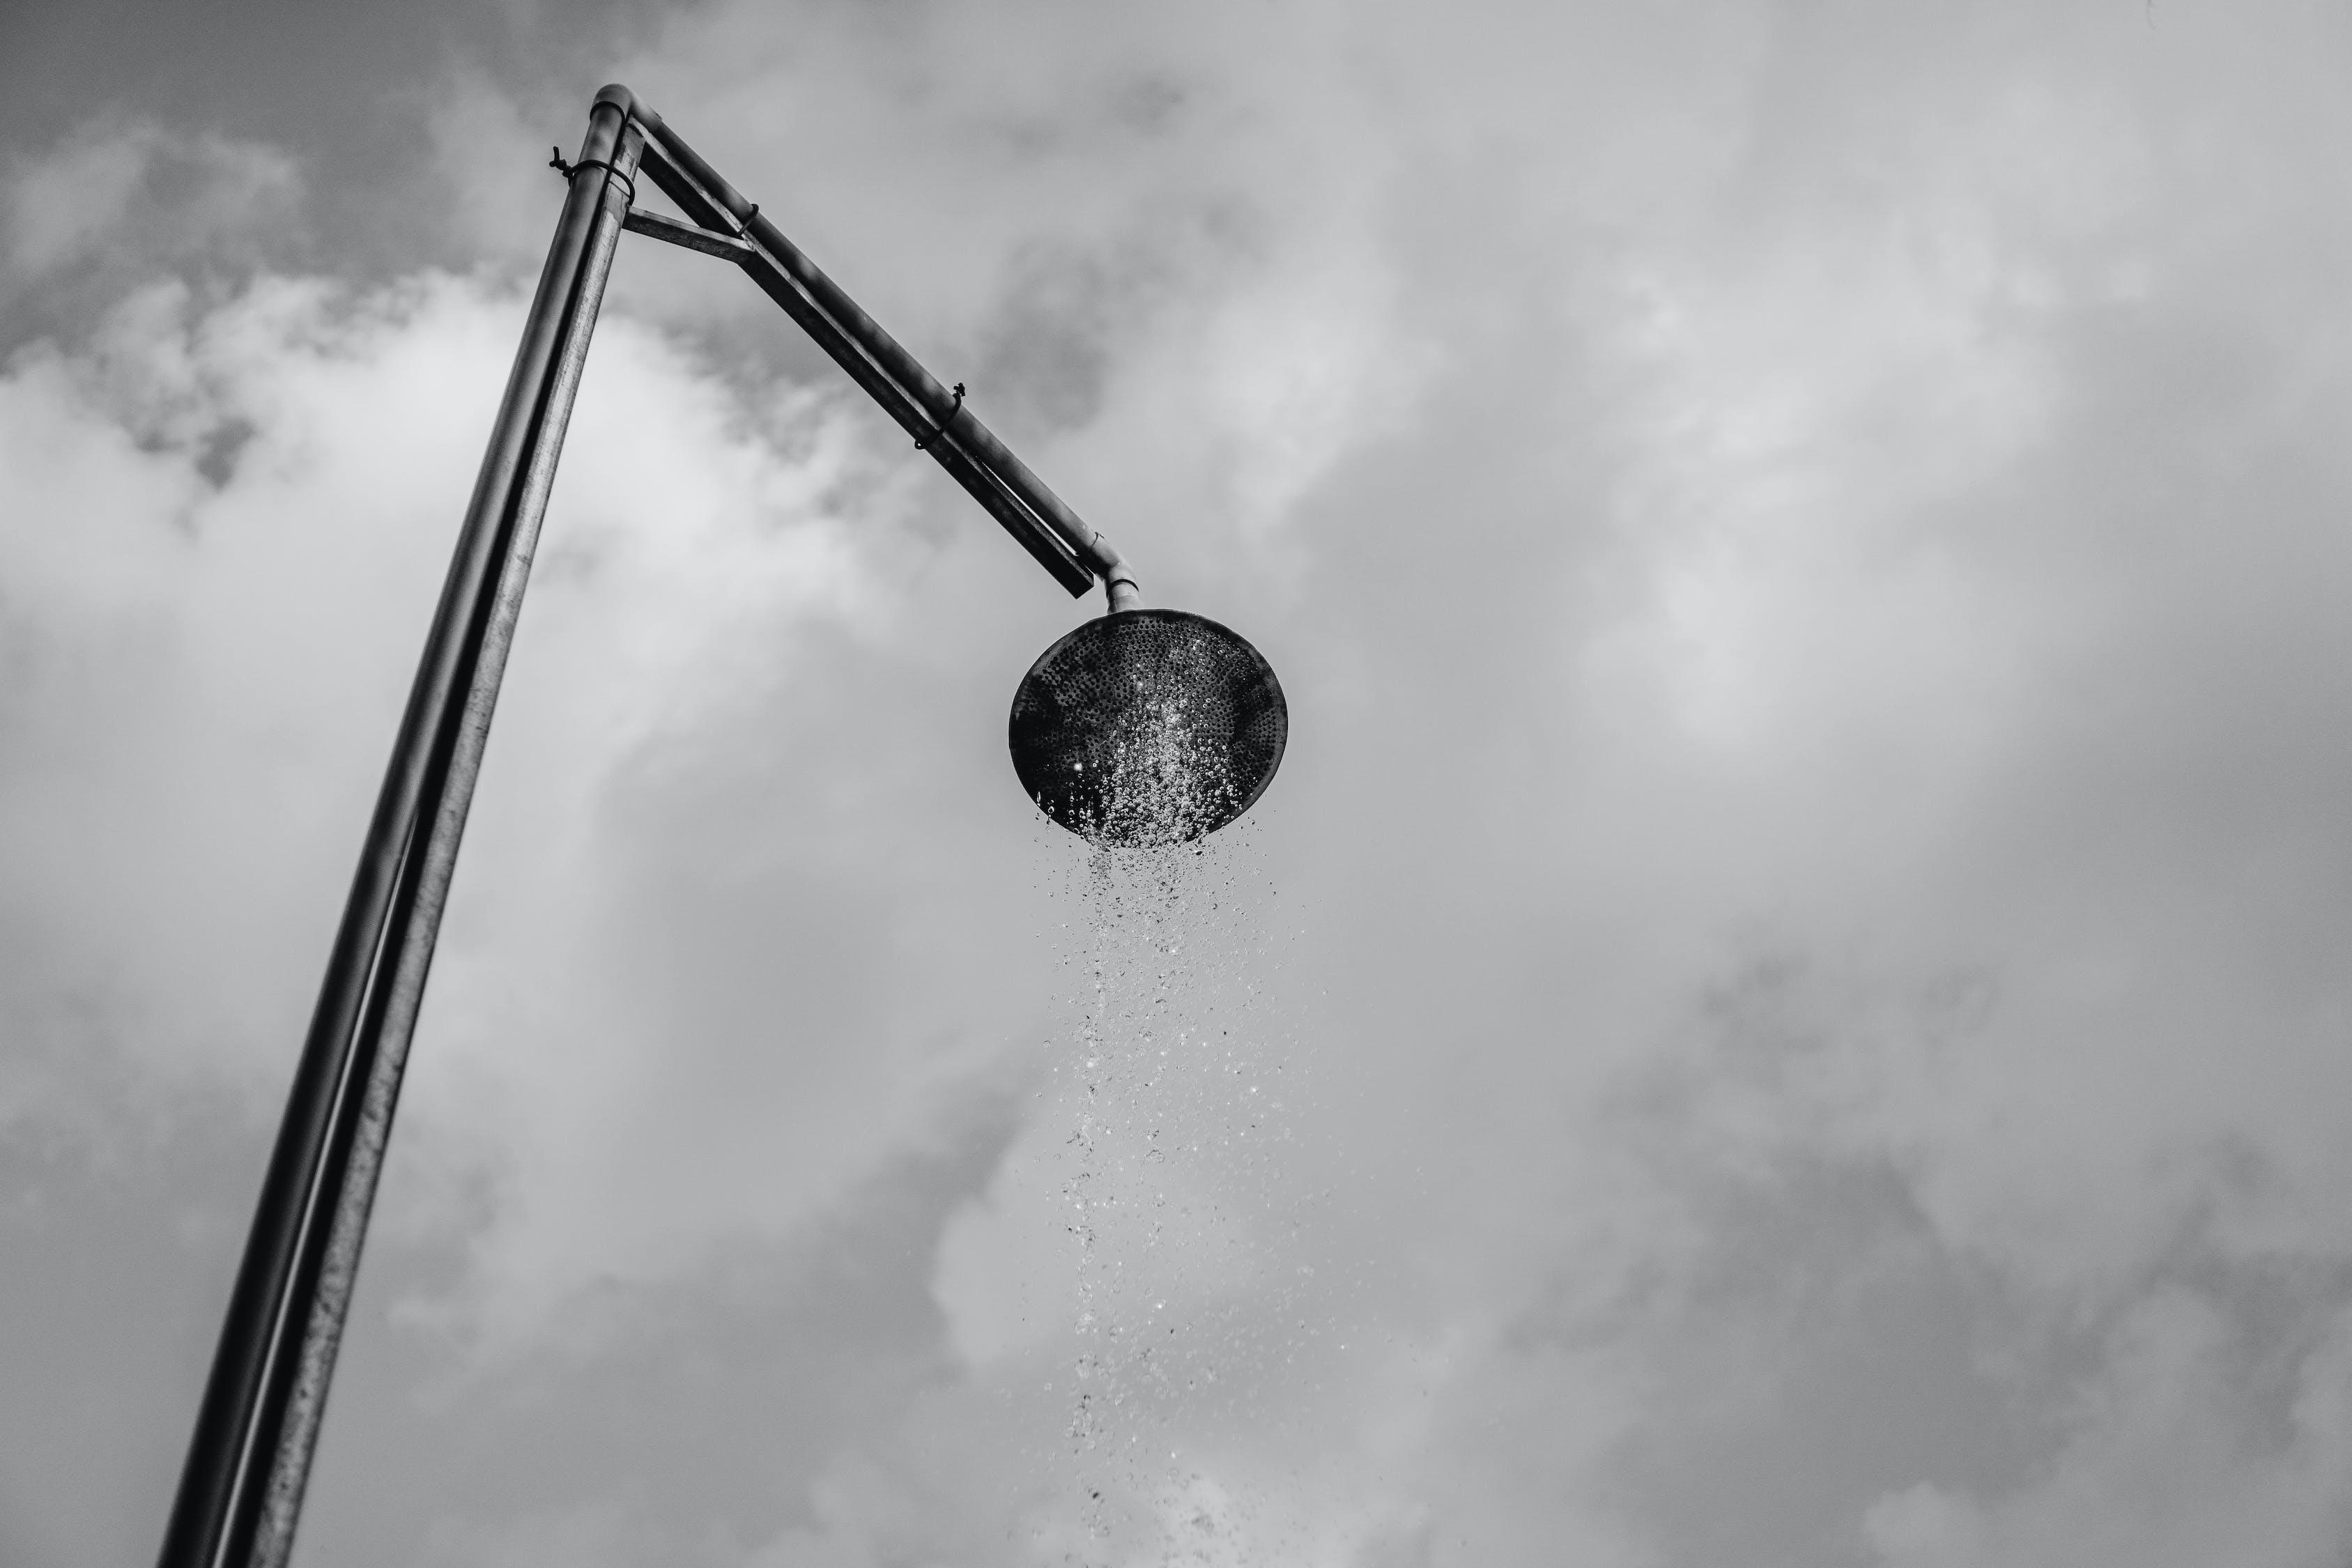 Water Splash on Stainless Steel Shower